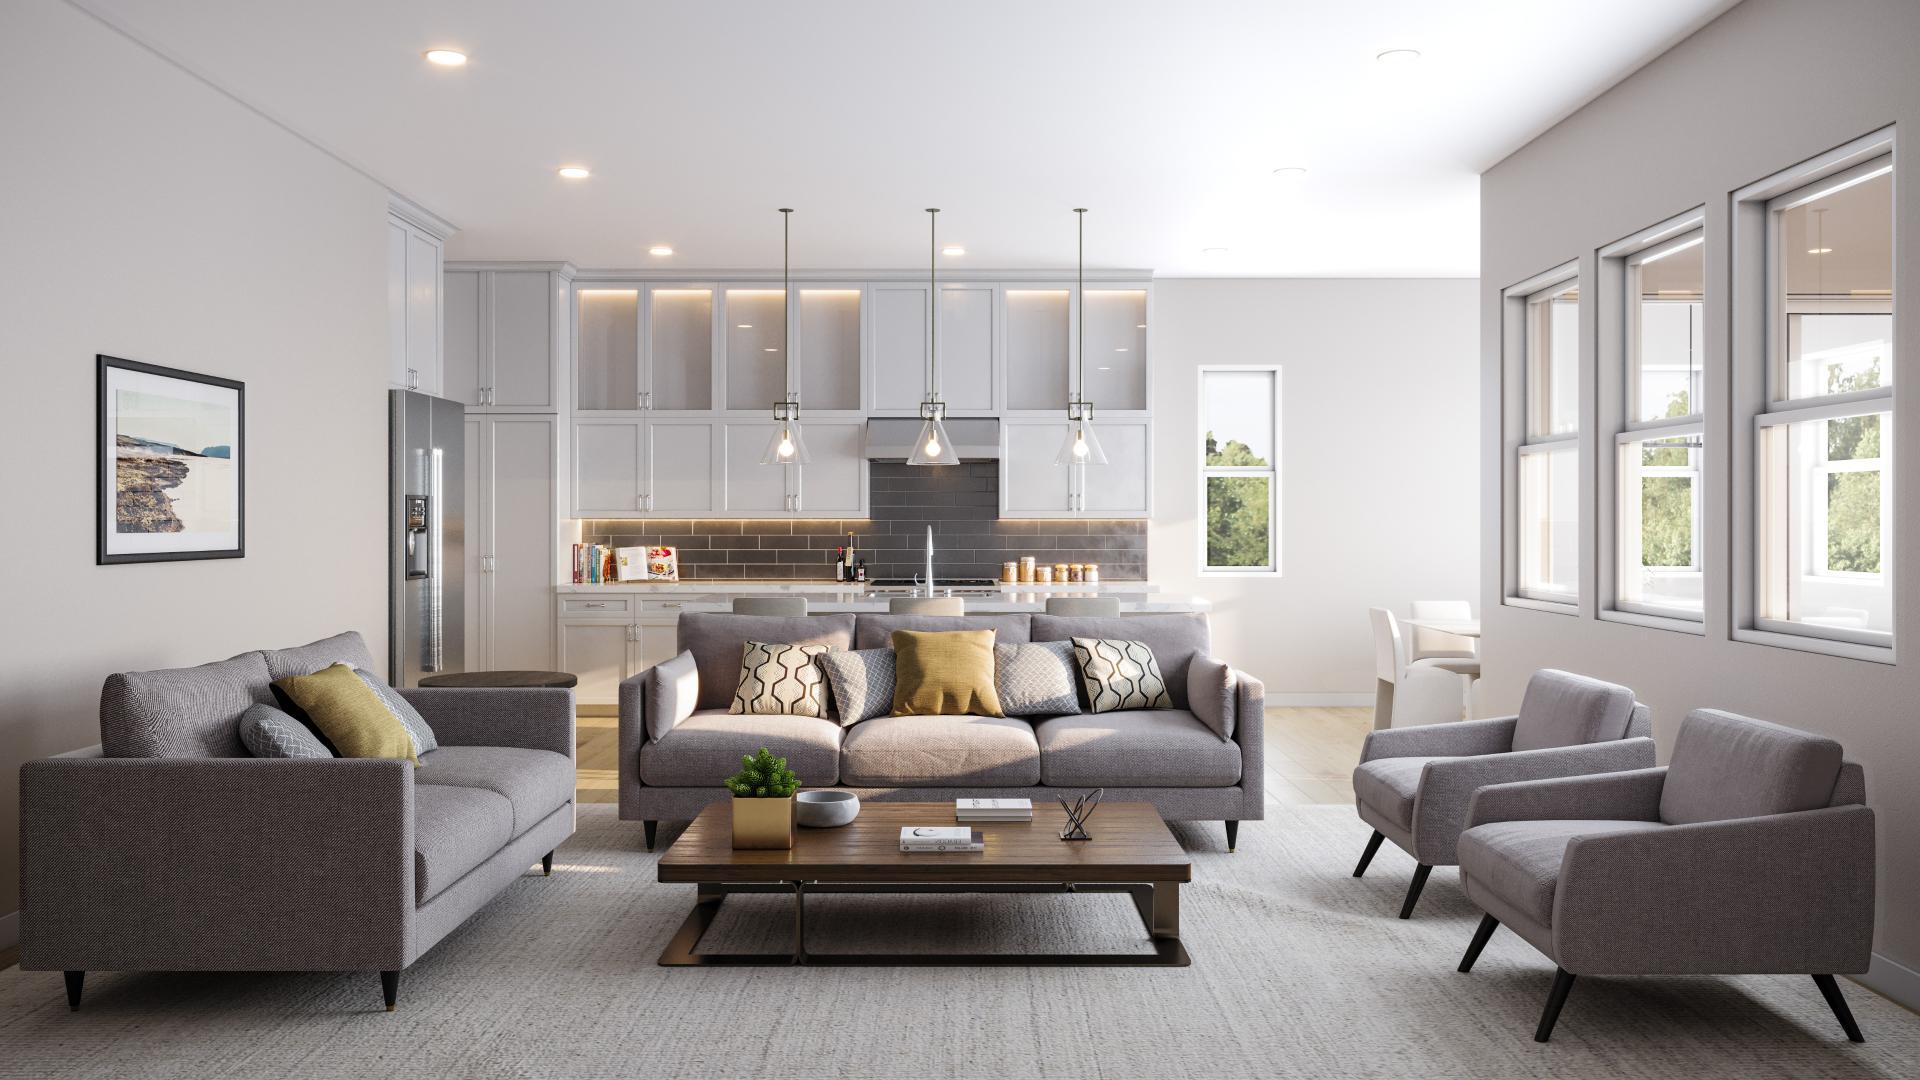 Spacious open-concept floor plans